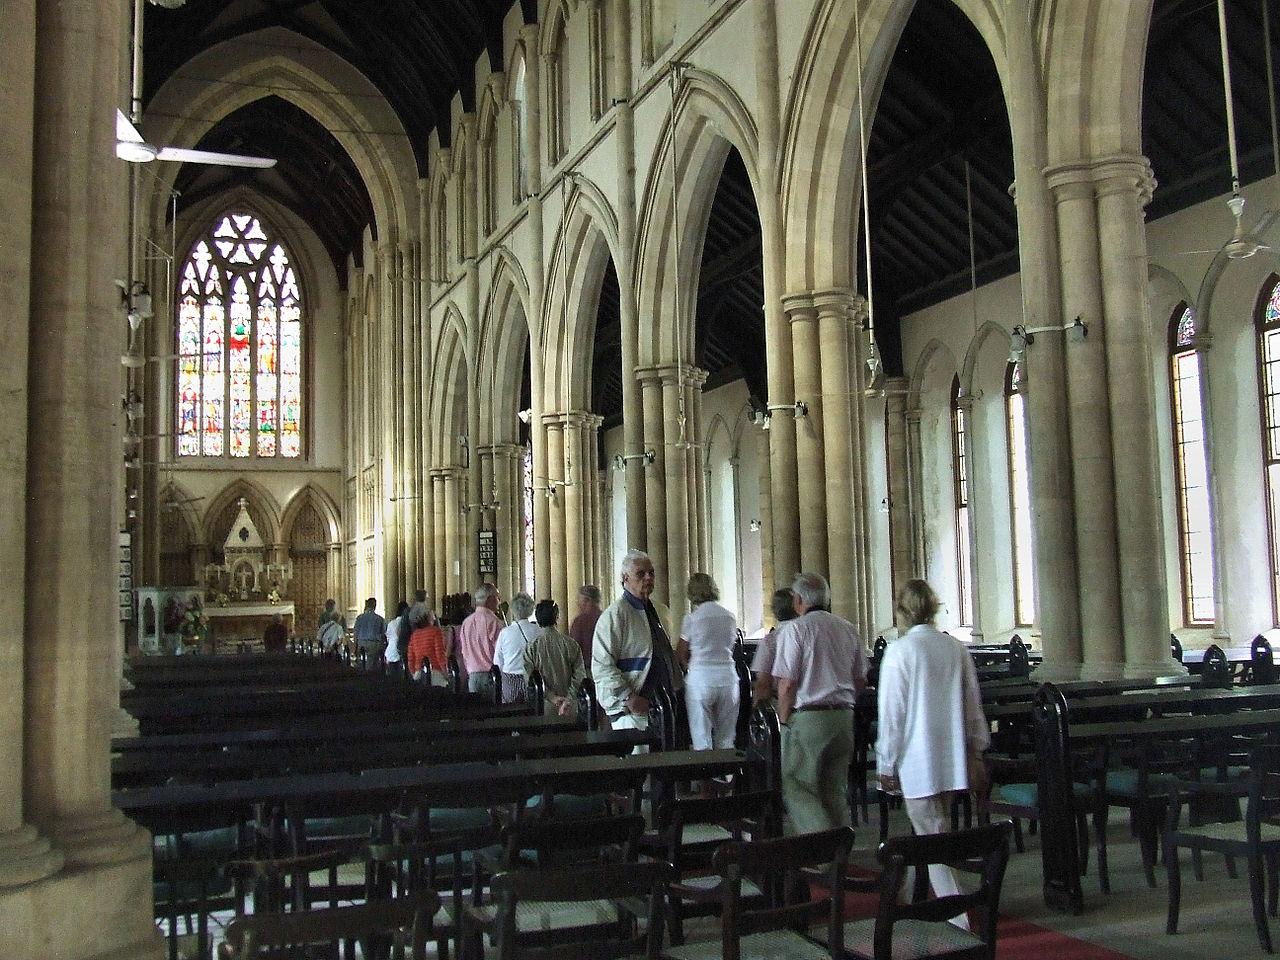 The Afghan Church Experience in Colaba, Mumbai